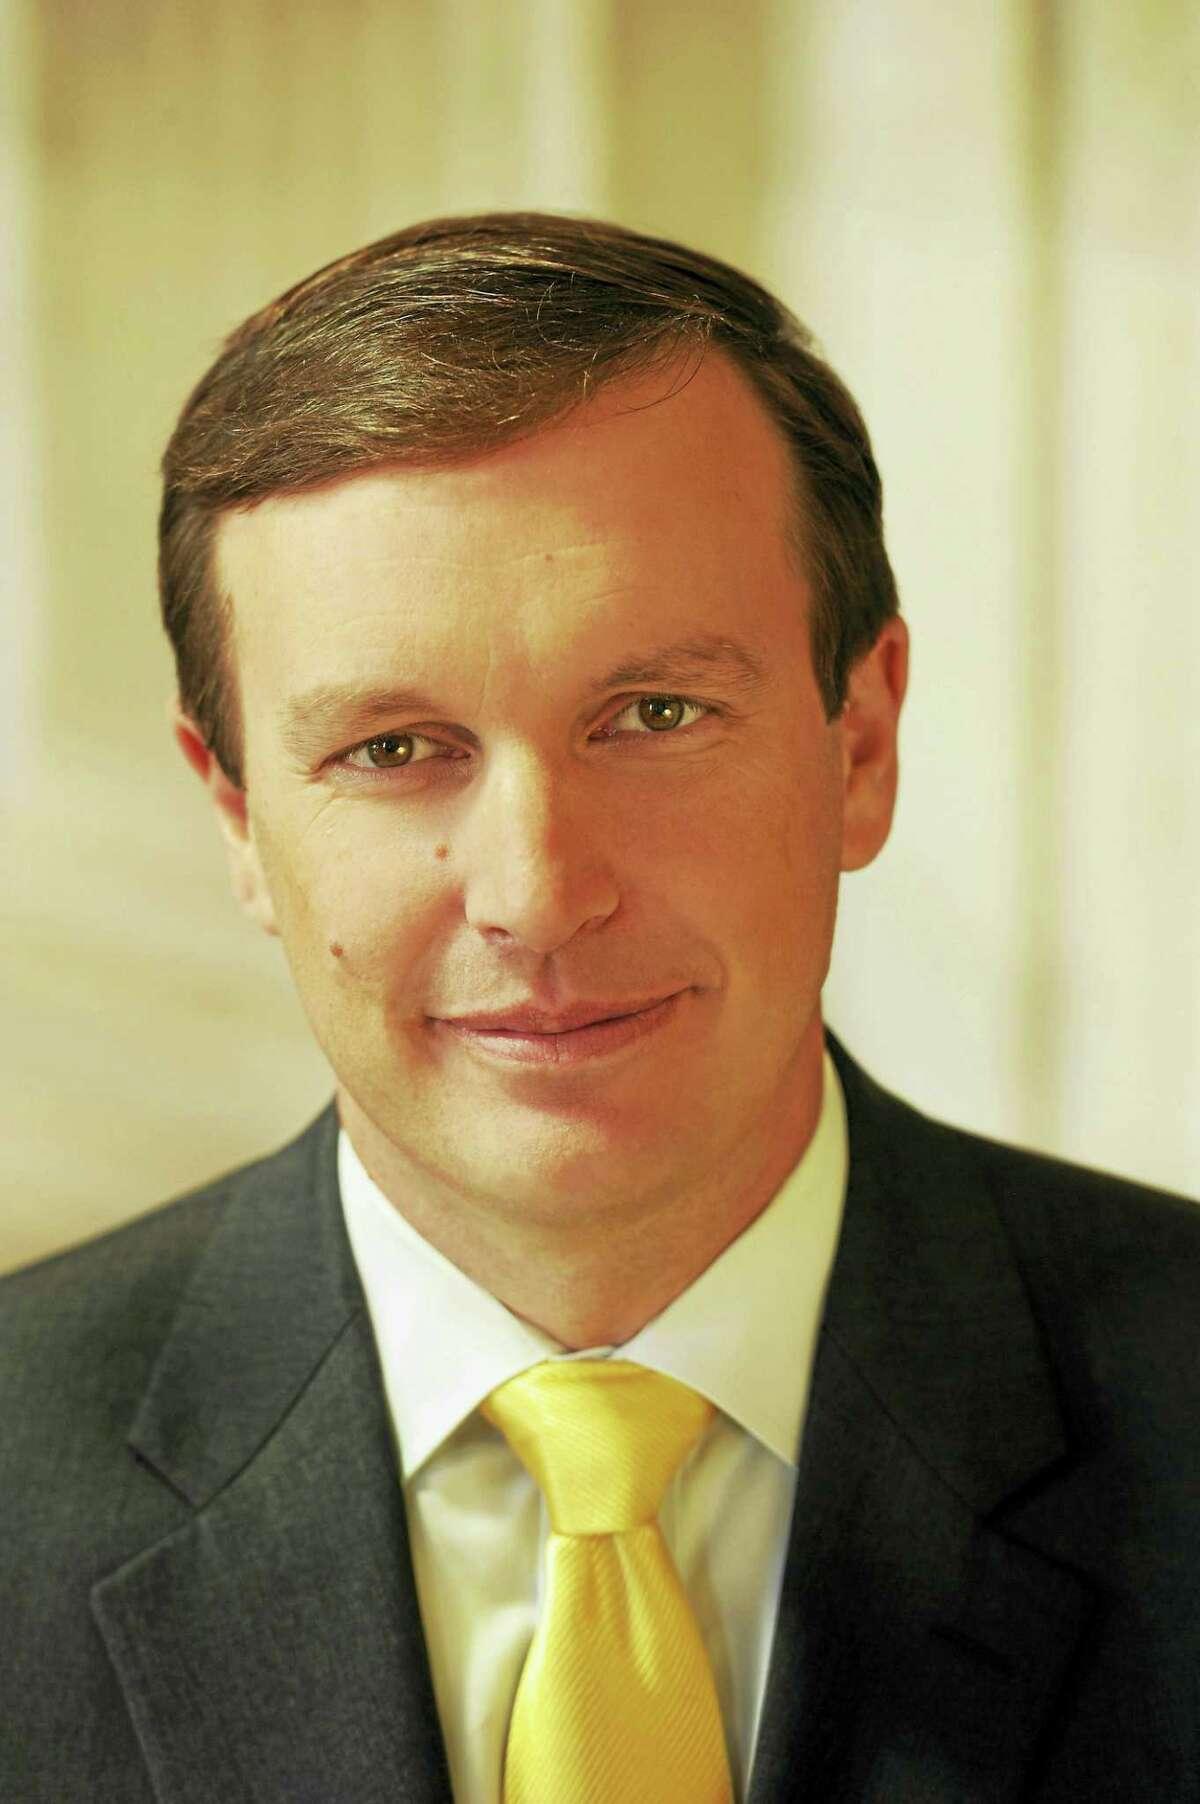 (Contributed photo) U.S. Sen. Chris Murphy, D-Conn.